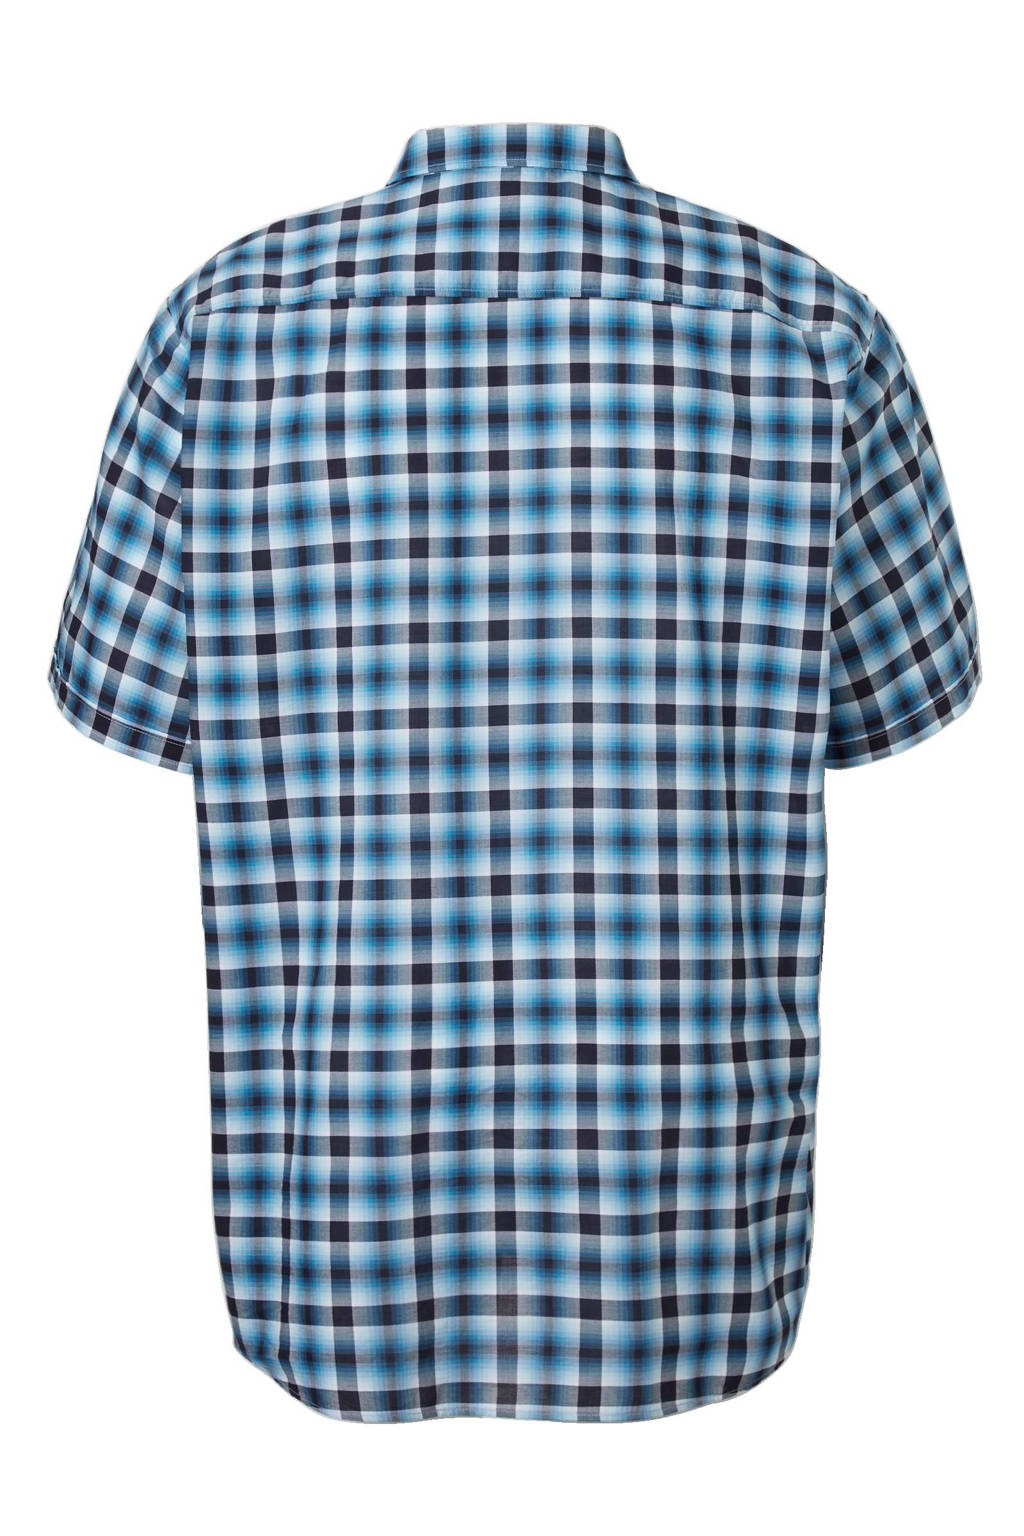 Overhemd Zwart Wit.Boss Athleisure Big Tall Barn Regular Fit Overhemd Wehkamp